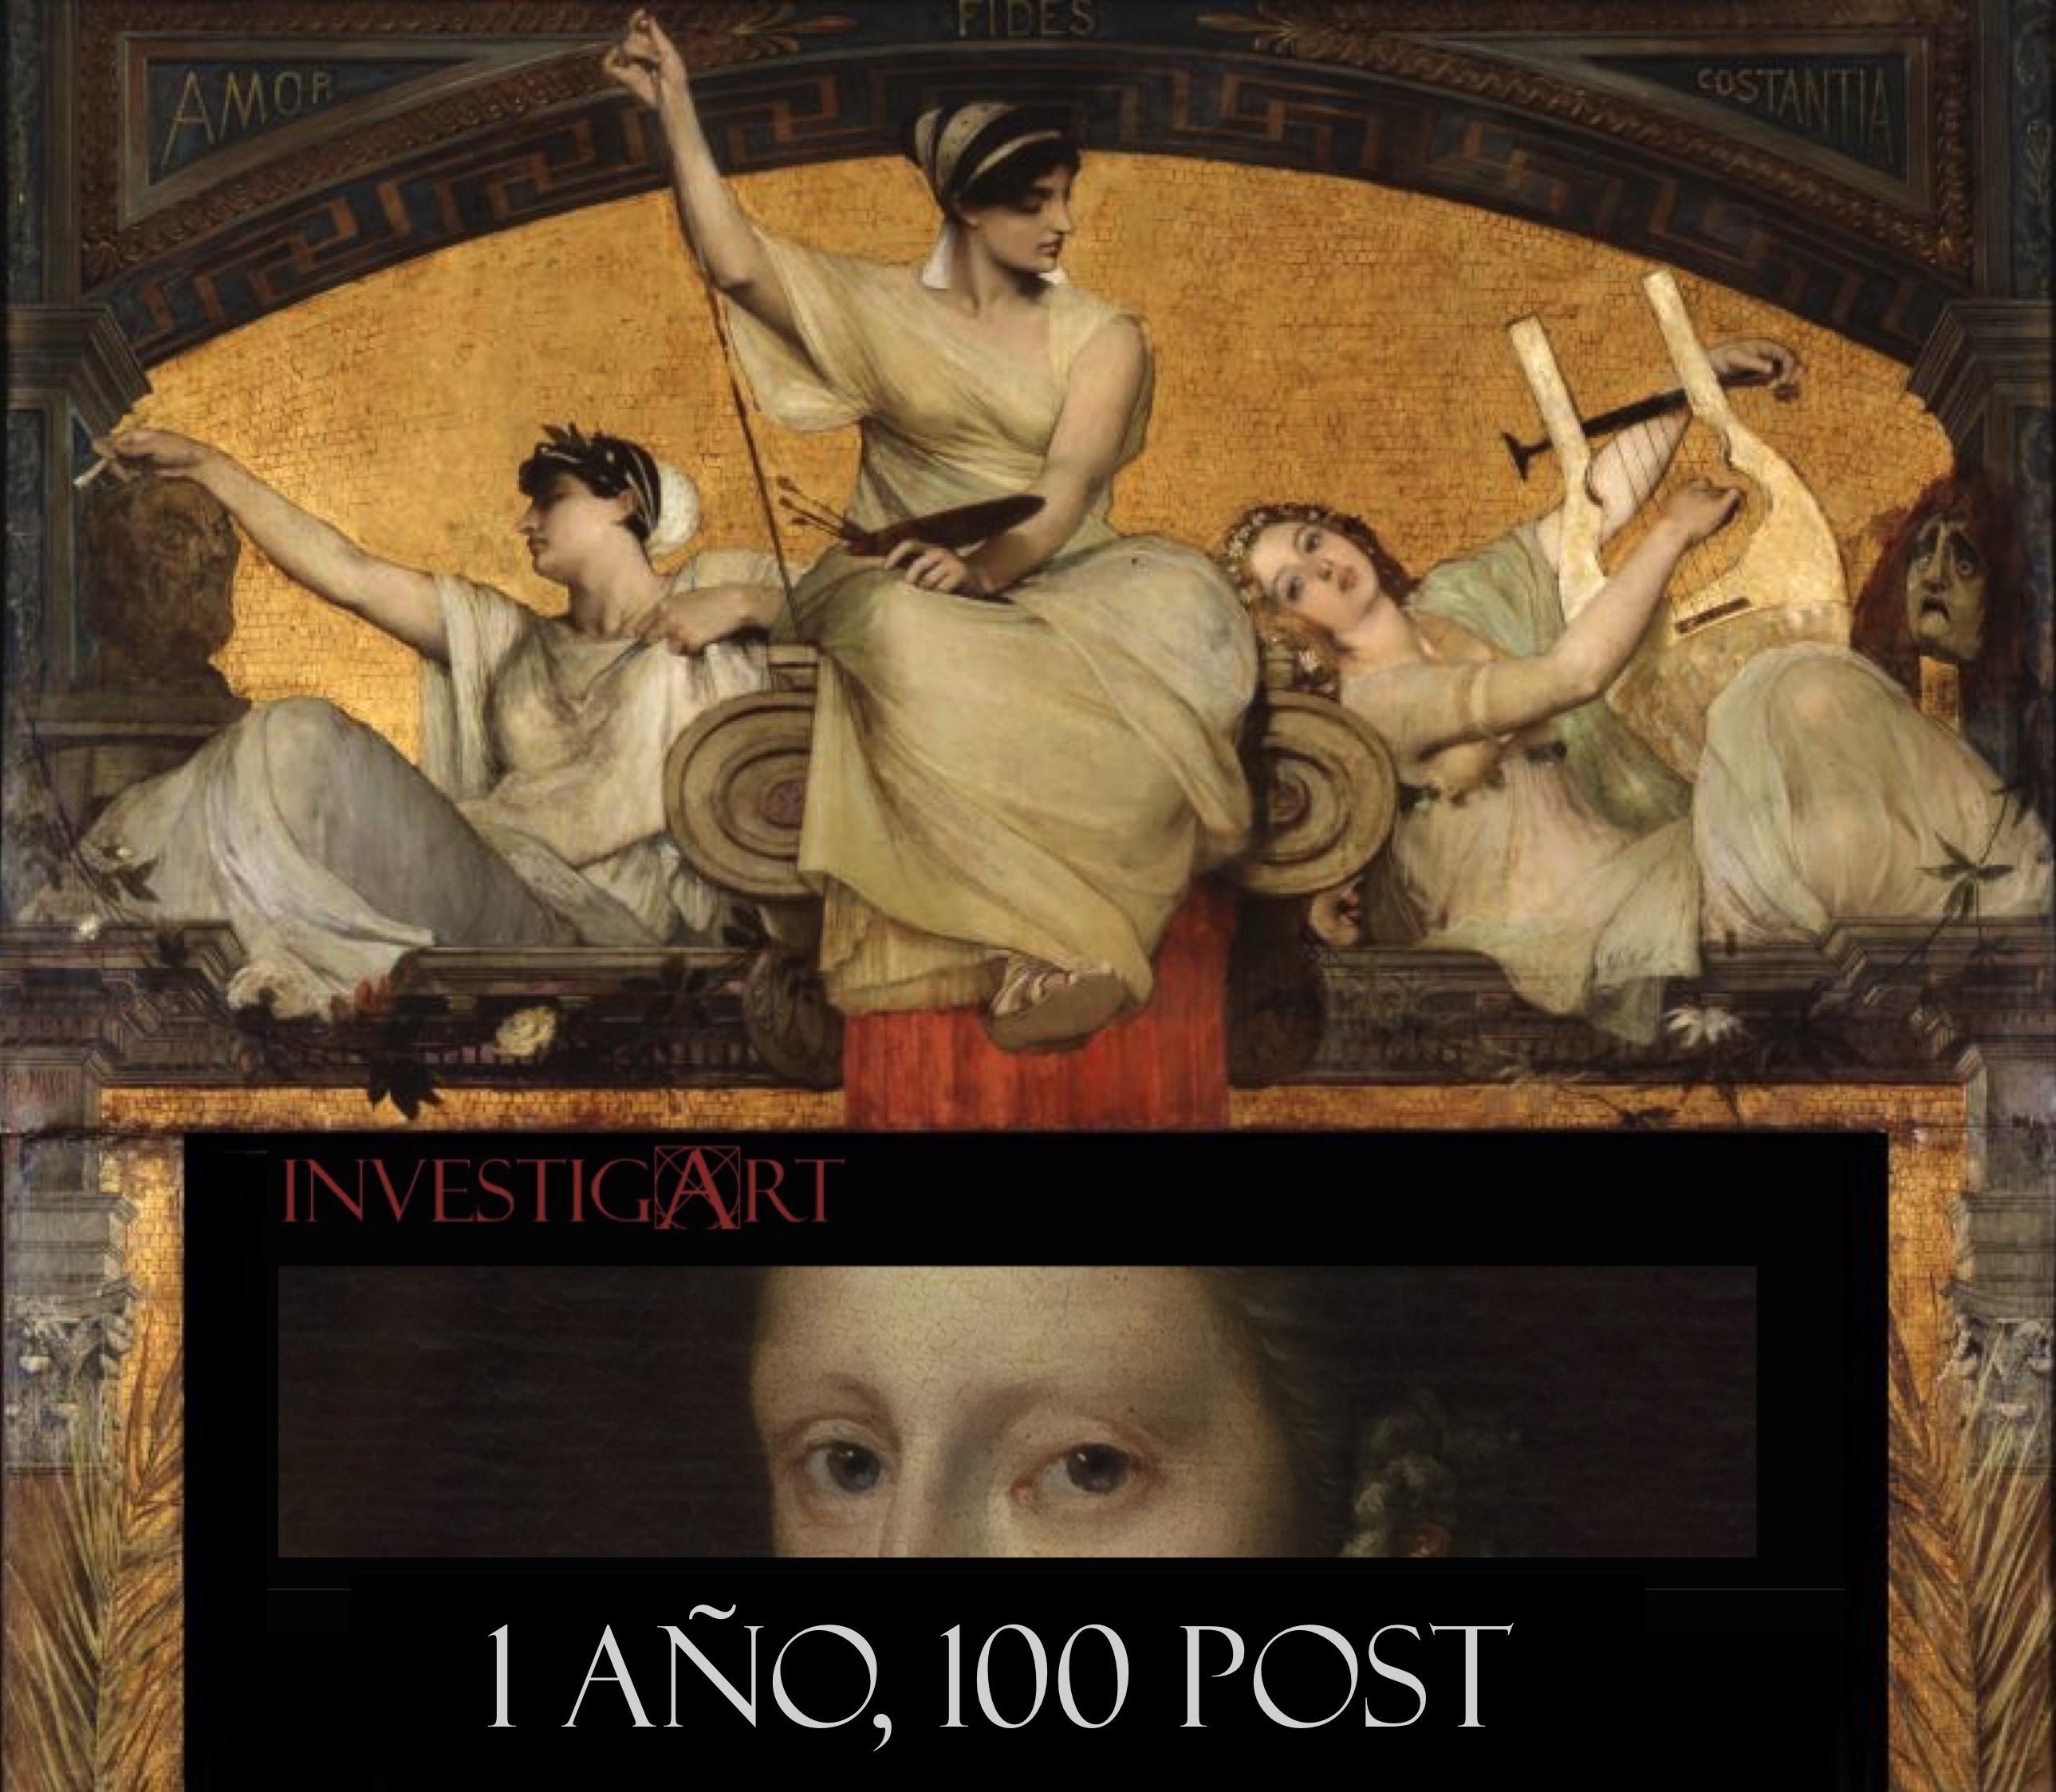 1 año, 100 post